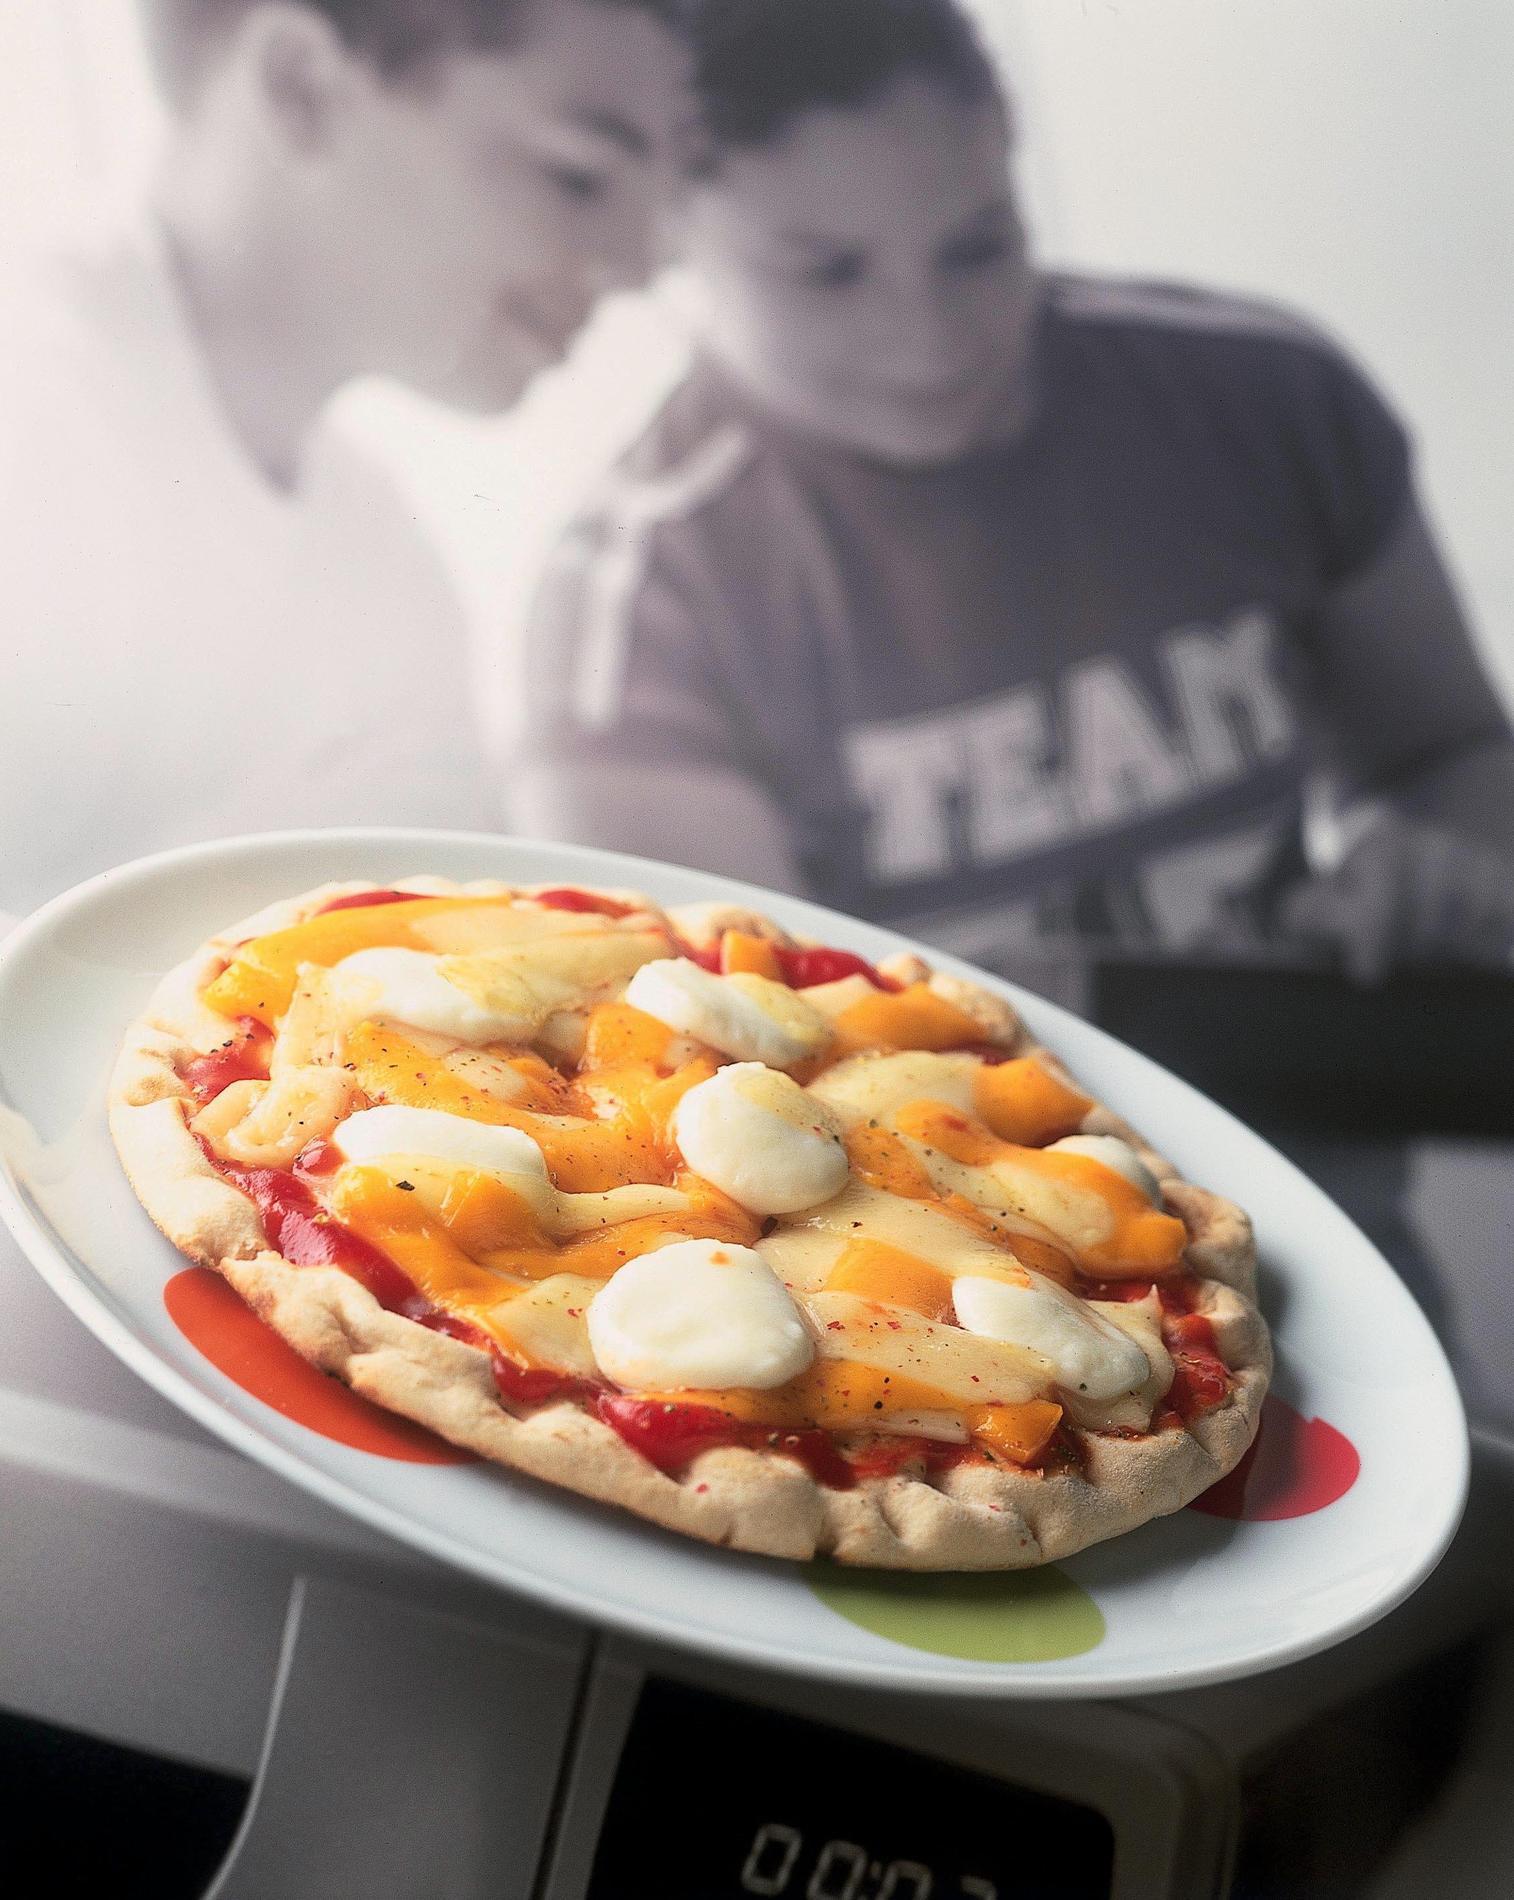 recette pizza aux fromages cuisine madame figaro. Black Bedroom Furniture Sets. Home Design Ideas